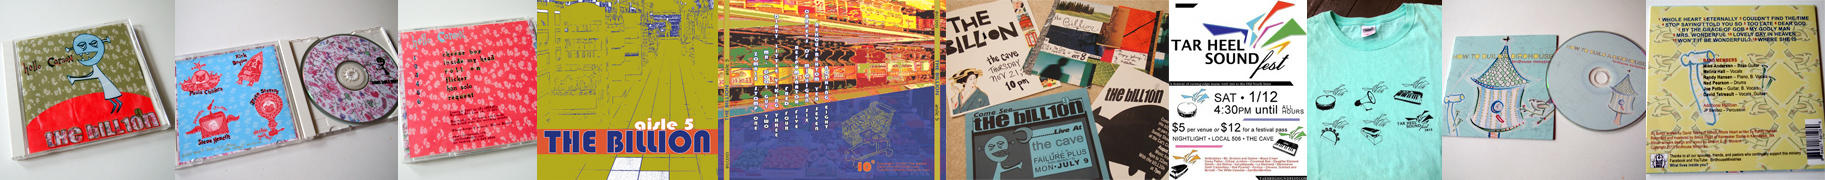 The Billion CDs: Hello Carson & Aisle 5, The Billion flyers, flyer & t-shirt for Tar Heel Sound Fest (my logo design), Birdhouse Ministries CD.